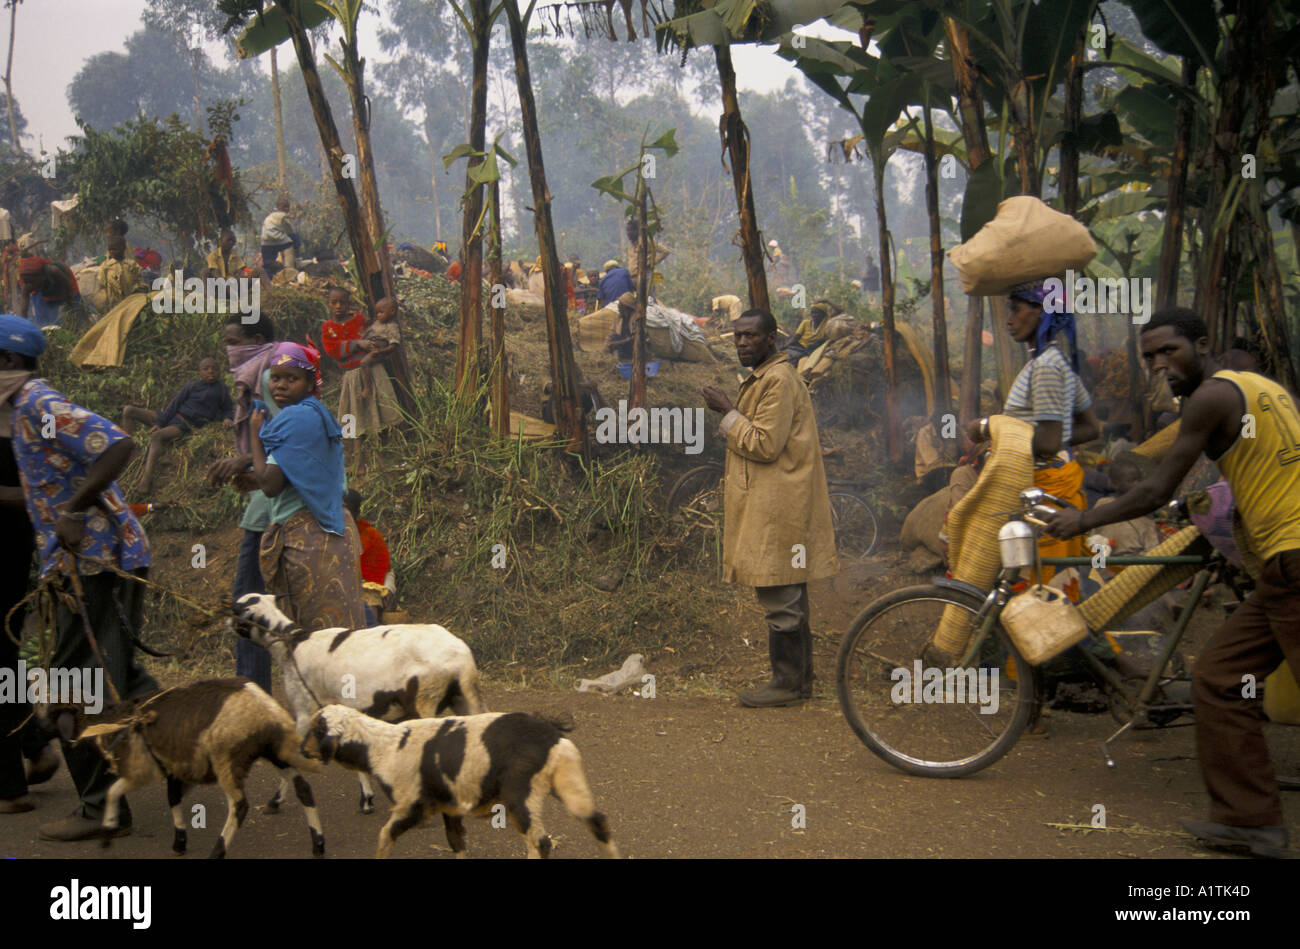 GOMA ZAIRE EXODUS FROM RWANDA CONTINUES ZAIRE RWANDA BORDER JULY 1994.People walk back to Rwanda with their animals - Stock Image